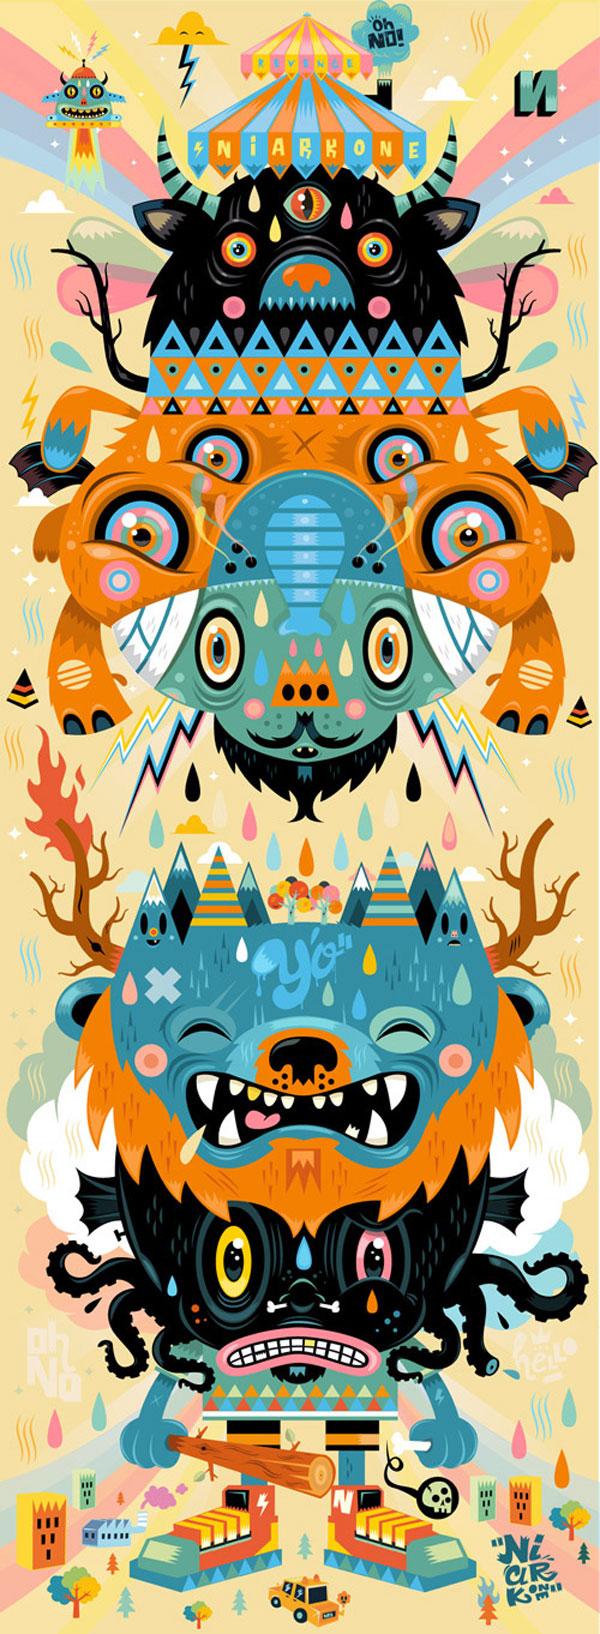 Illustration #8 ( special symmetry ) 2